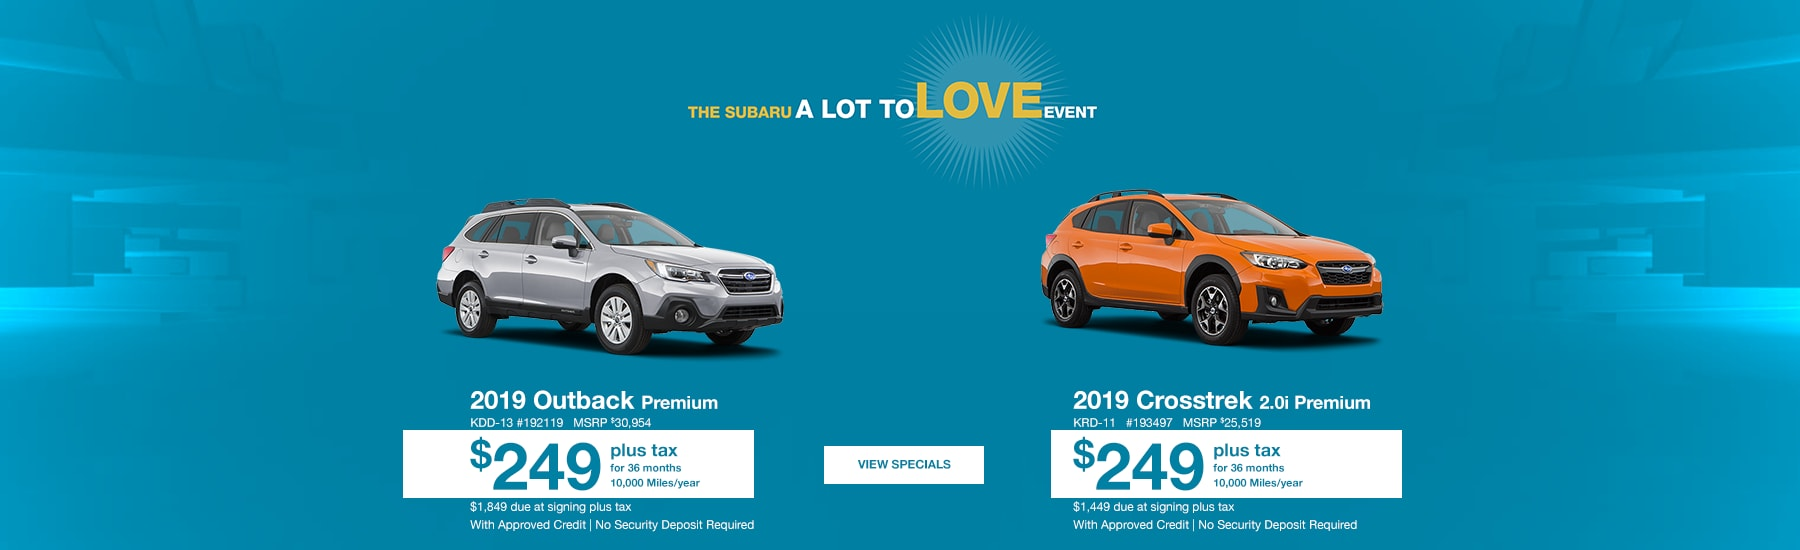 New & Used Subaru Sales in Colorado Springs CO | Heuberger Subaru